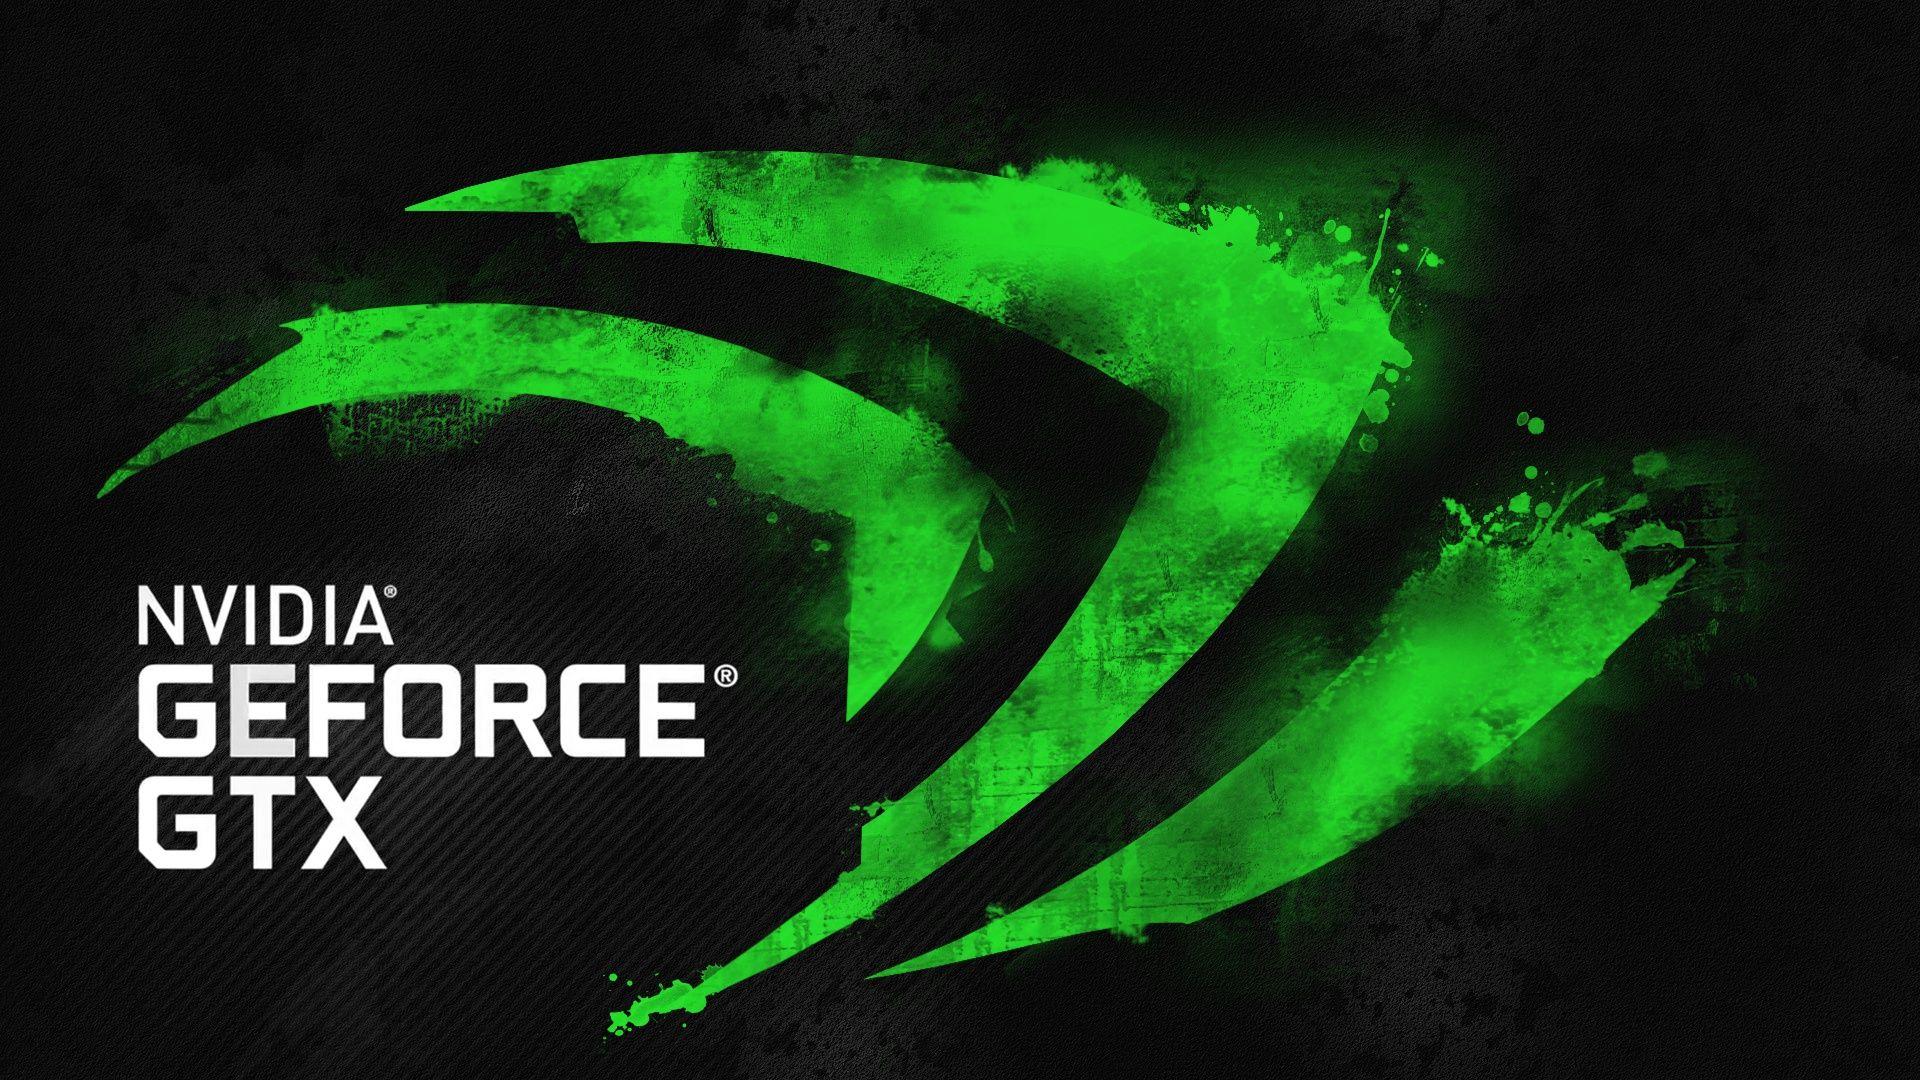 Download Geforce Gtx Nvidia Green Logo Hd Wallpaper 1920x1080 Like